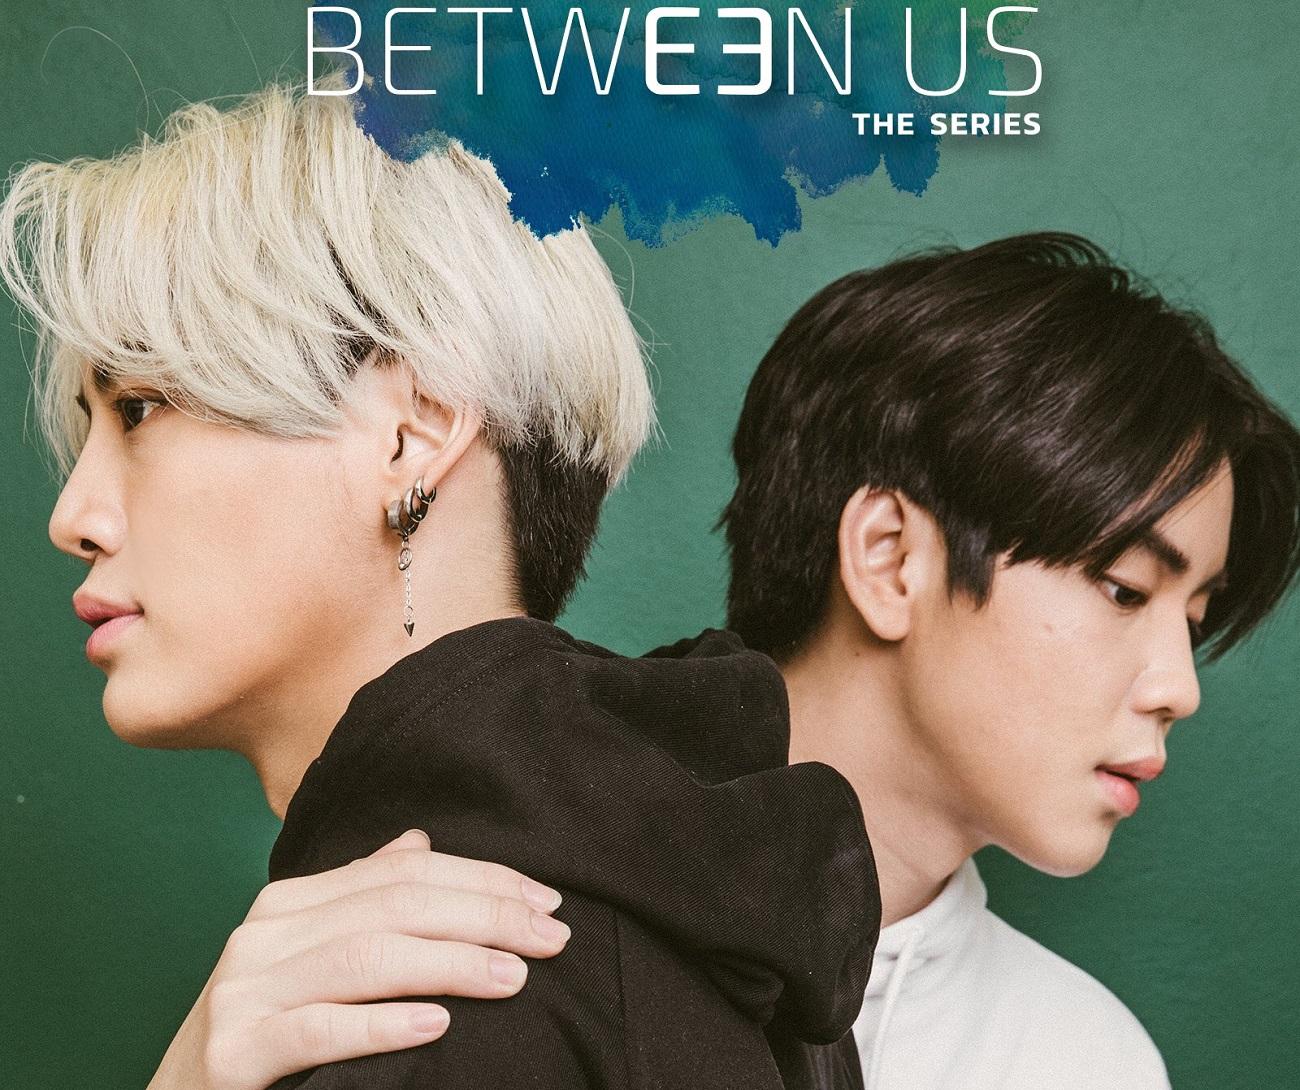 Between Us The Series ( Thailand 2021 ) : Sinopsis dan Review